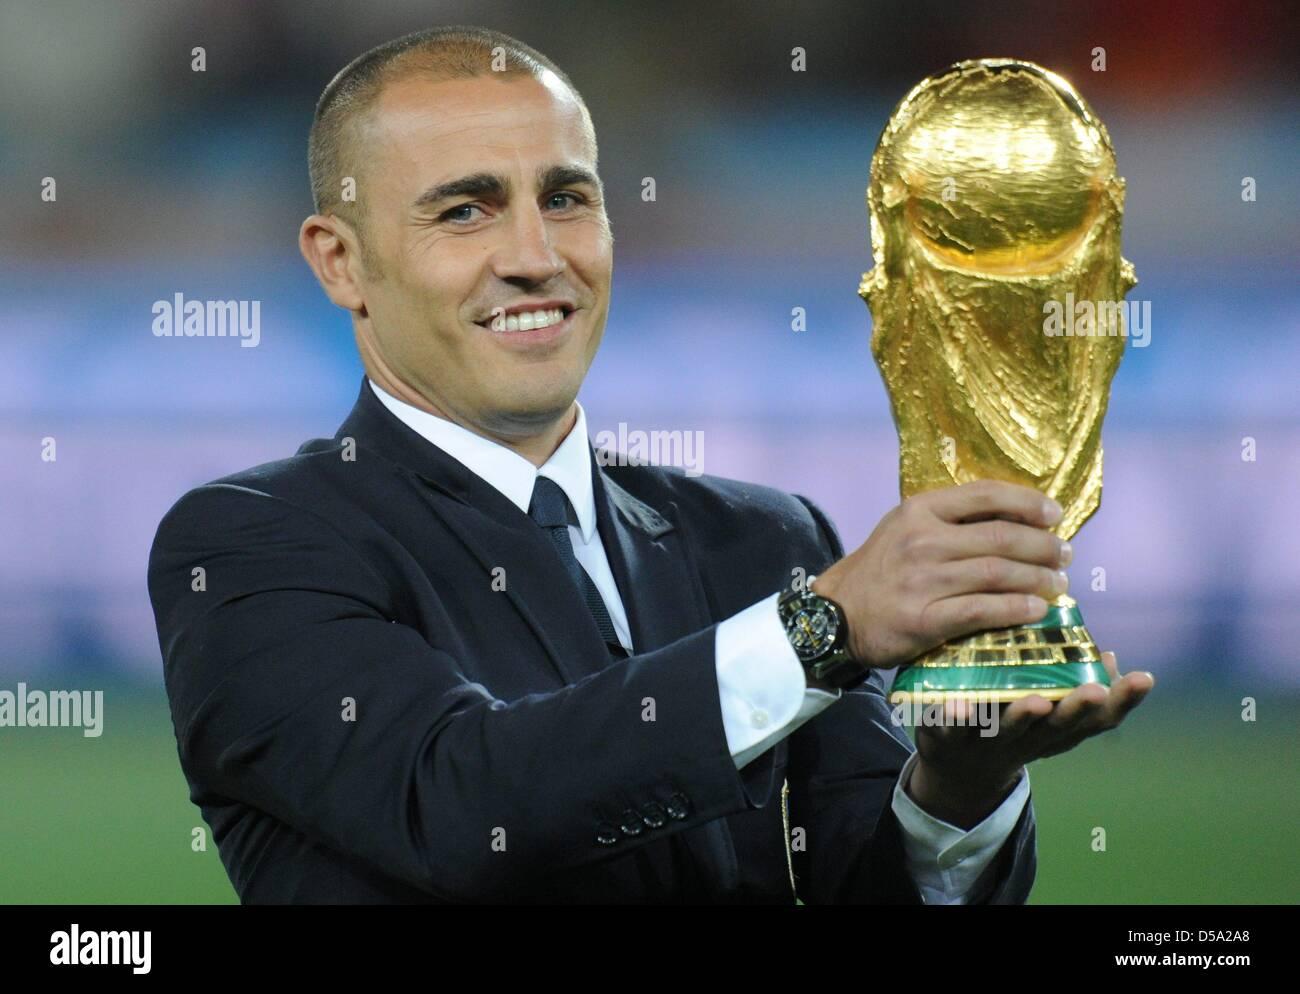 Italian captain Fabio Cannavaro holds up the World Cup Trophy